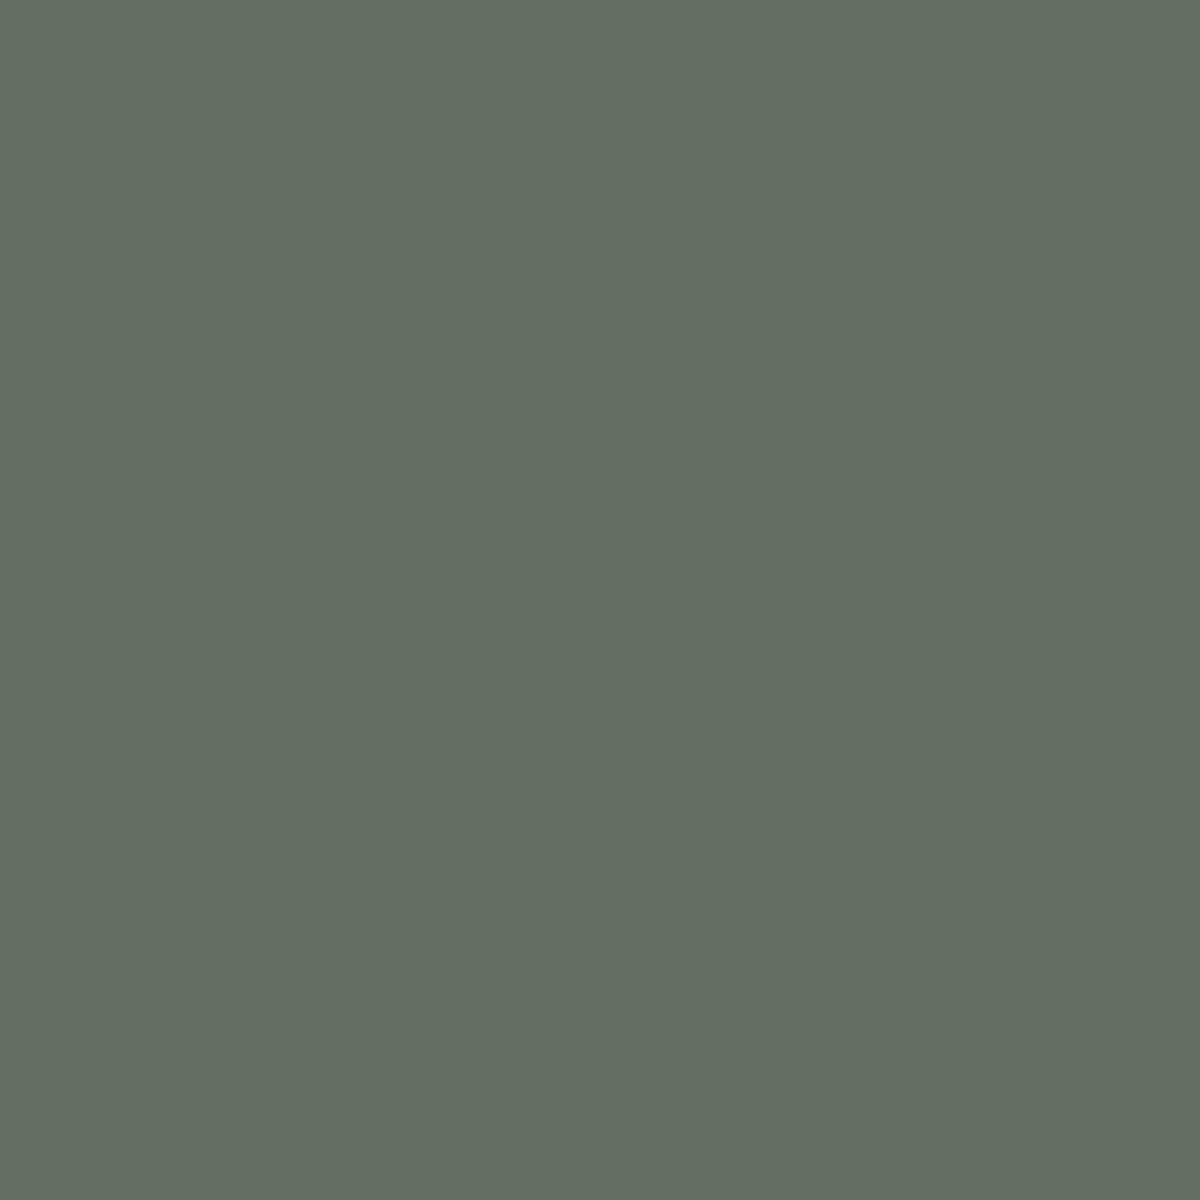 Ironworks Radiators Inc. farrow and ball green smoke paint finish